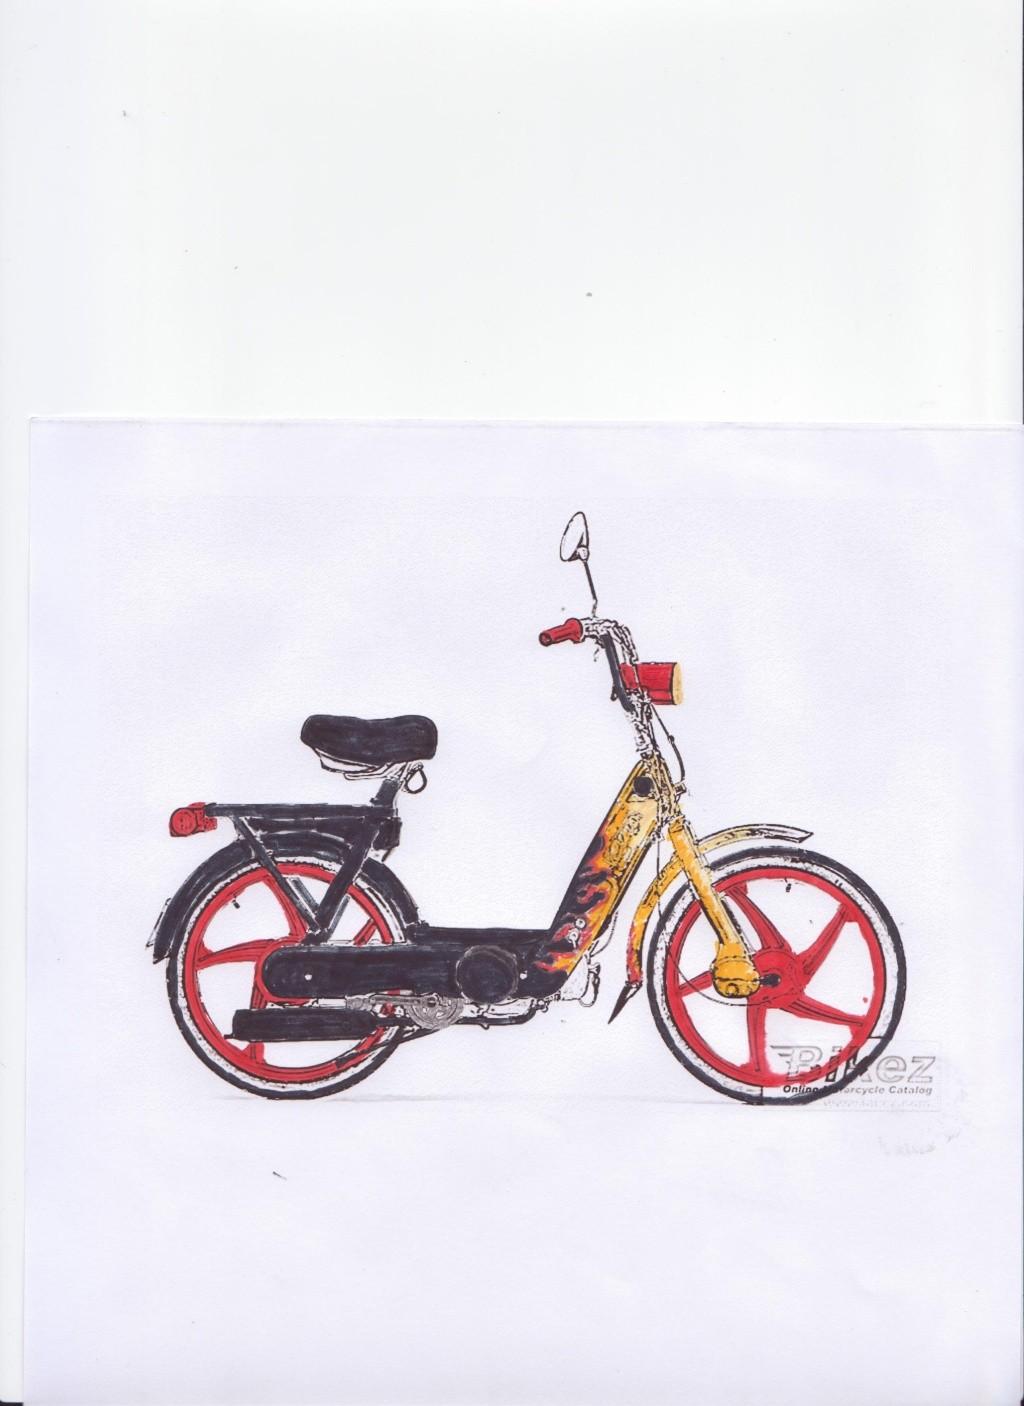 projet ciao racing à jmjfreeride!! - Page 4 Mon10